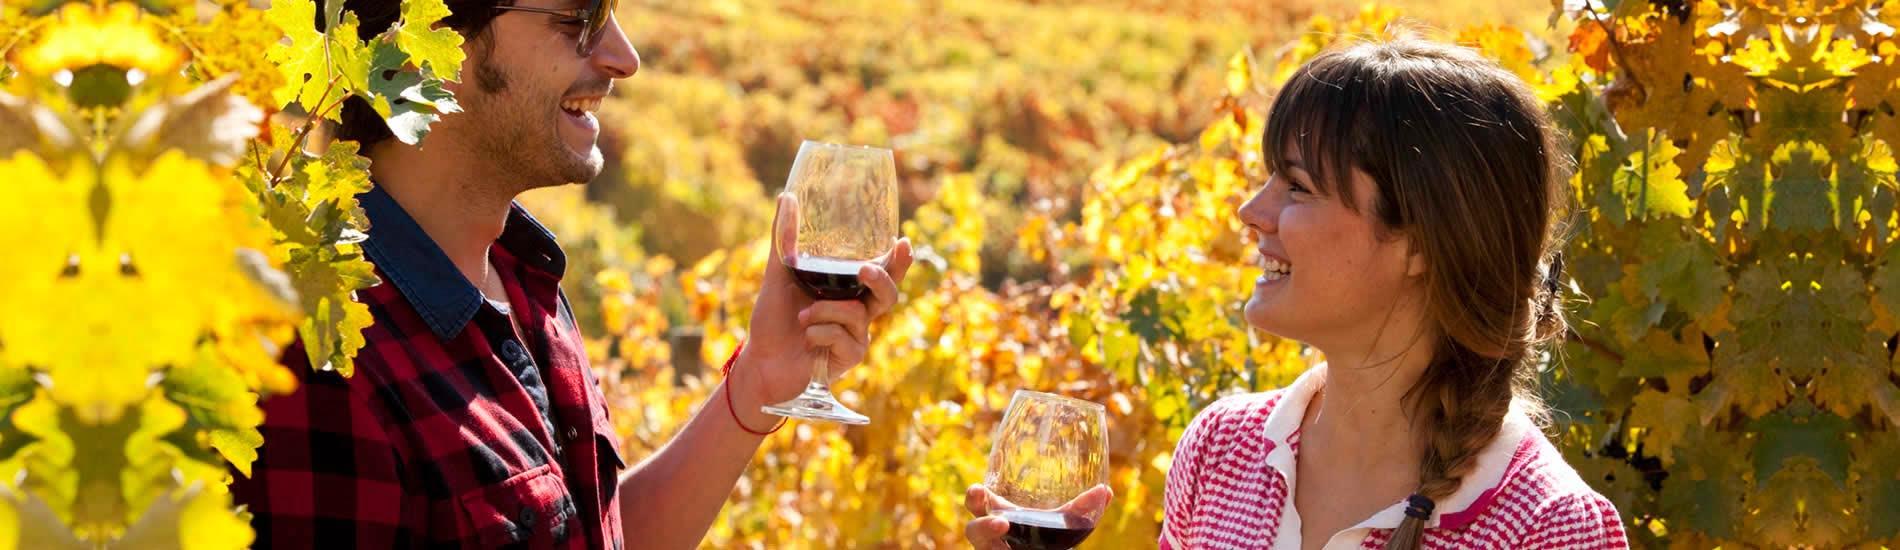 destacado_vino2